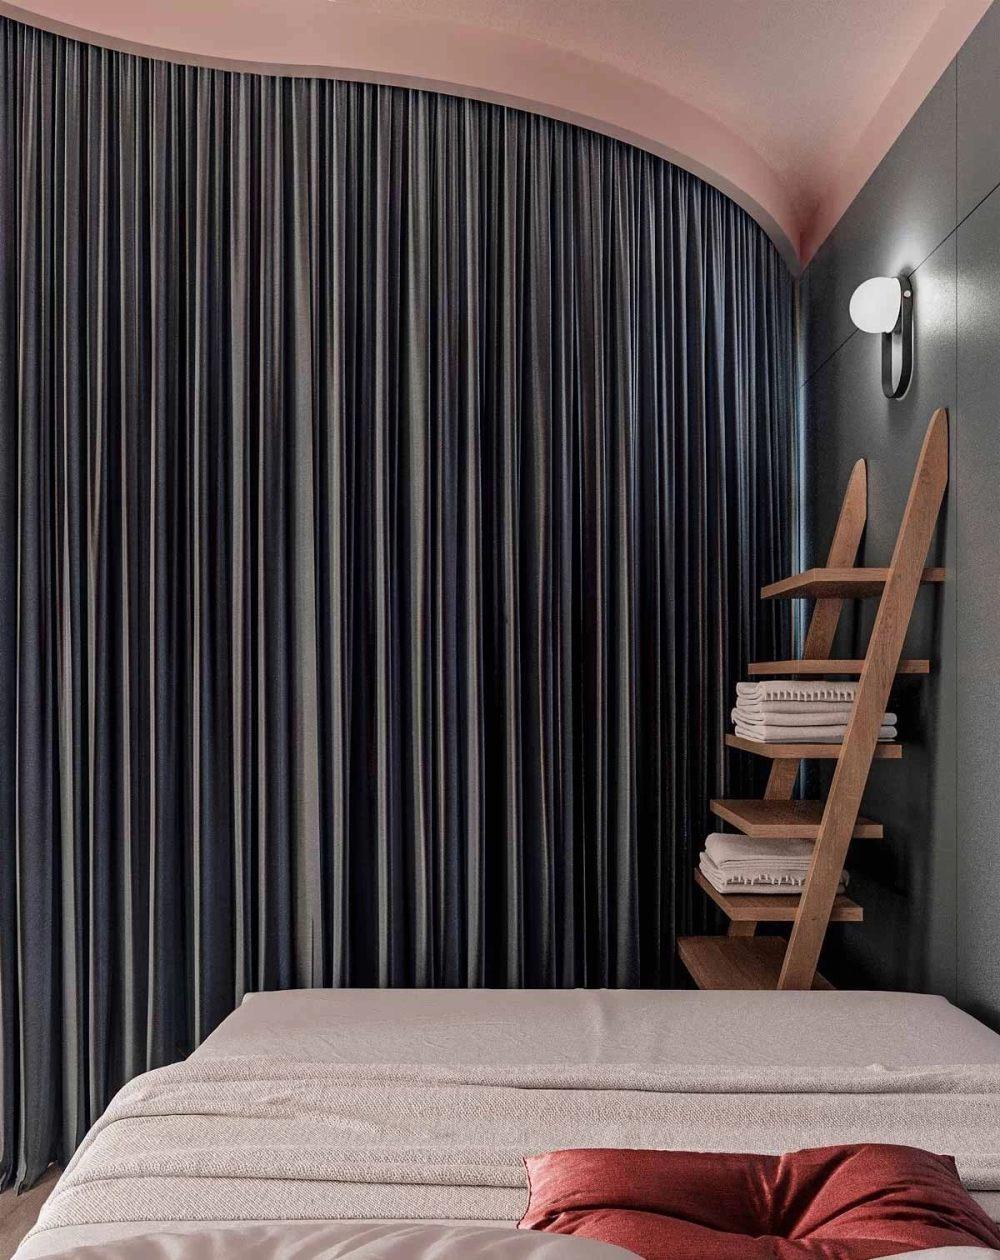 【ZROBYM architects】白俄罗斯明斯克州 高颜值、高质感住宅  _白俄罗斯明斯克州高颜值、高质感住宅13.jpg